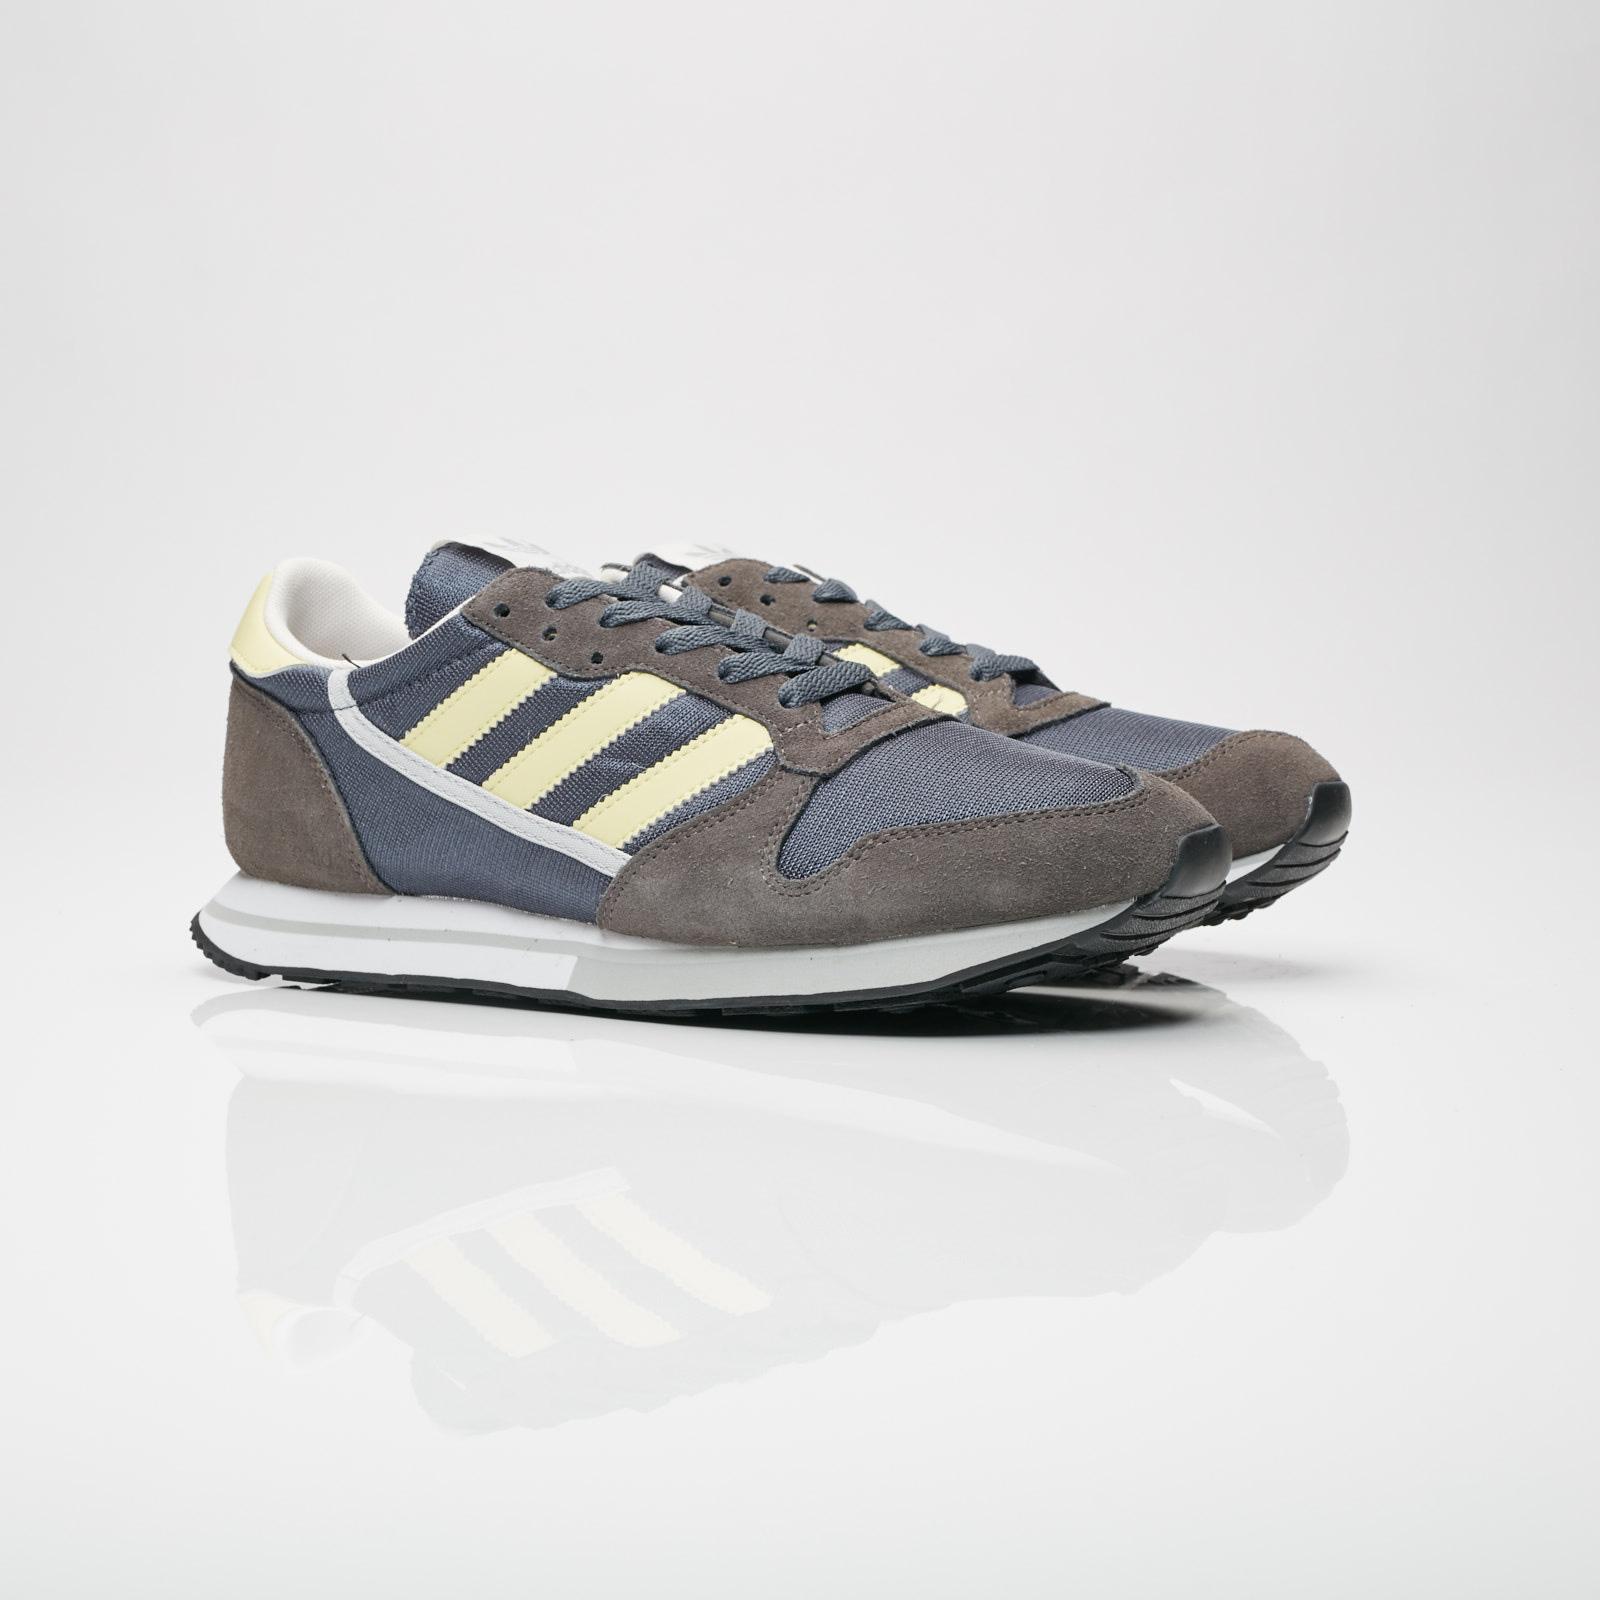 adidas ZX 280 - Da8750 - Sneakersnstuff